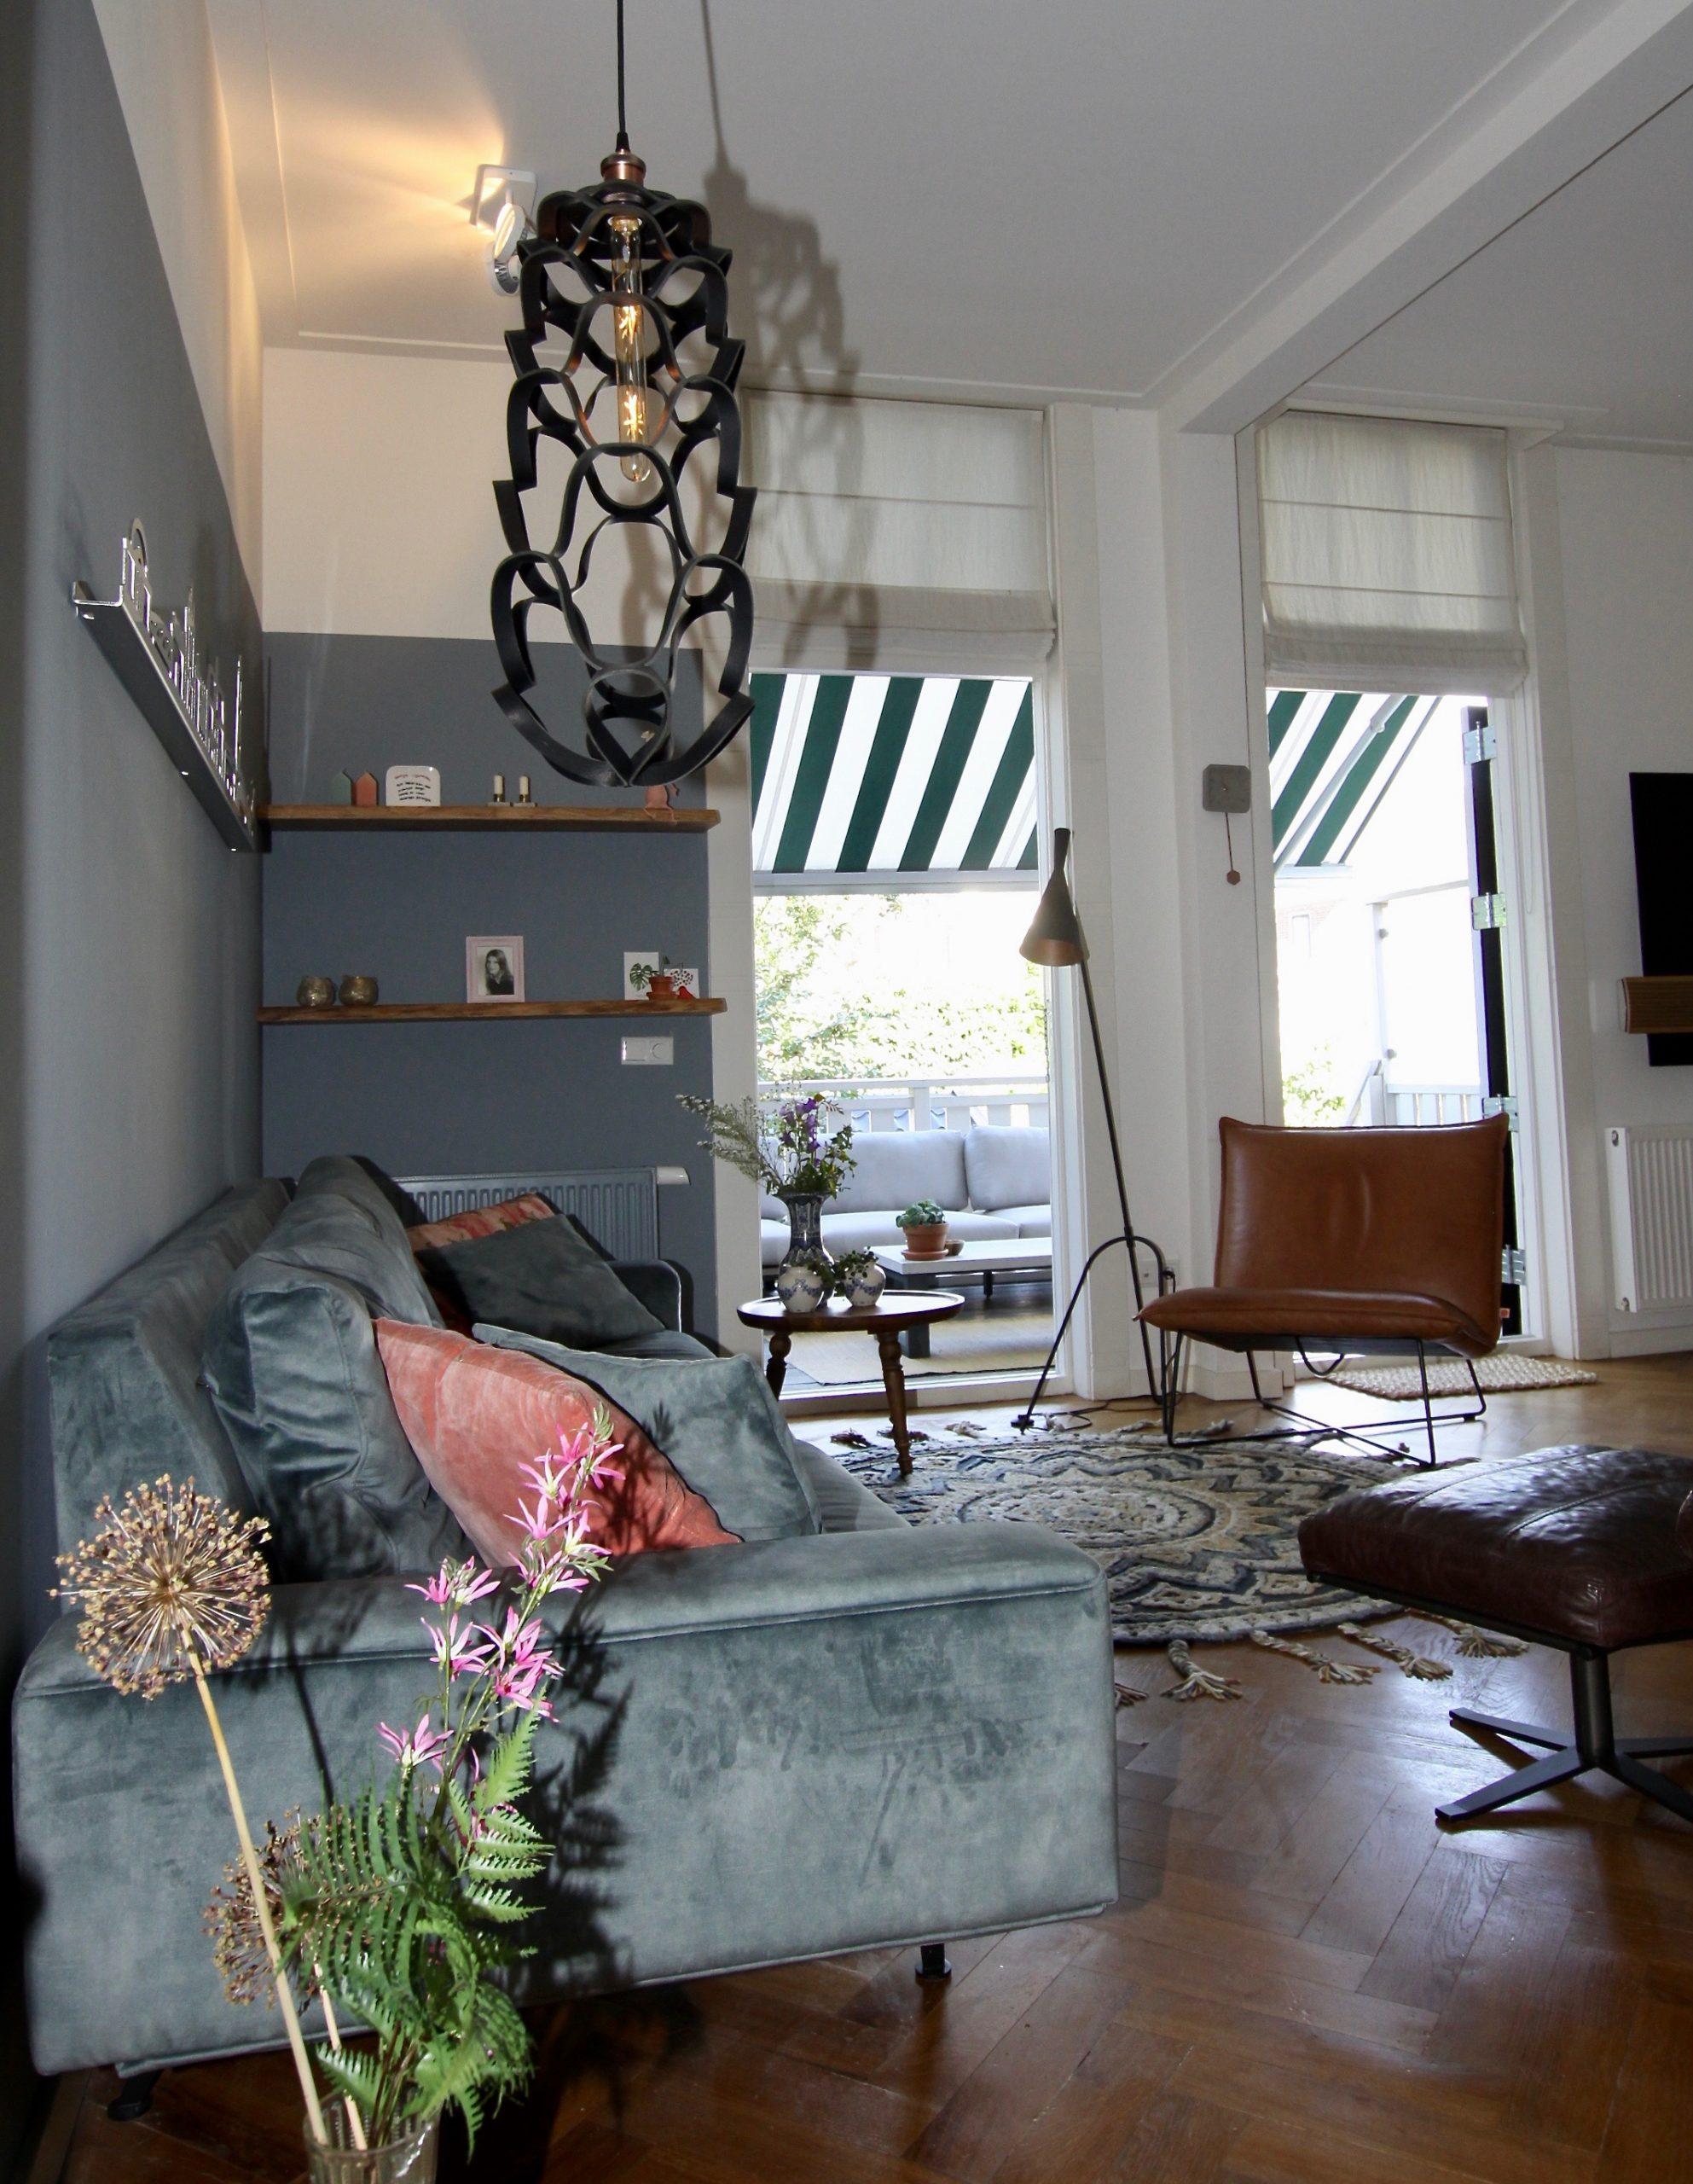 Appartement met tuin Zwolle